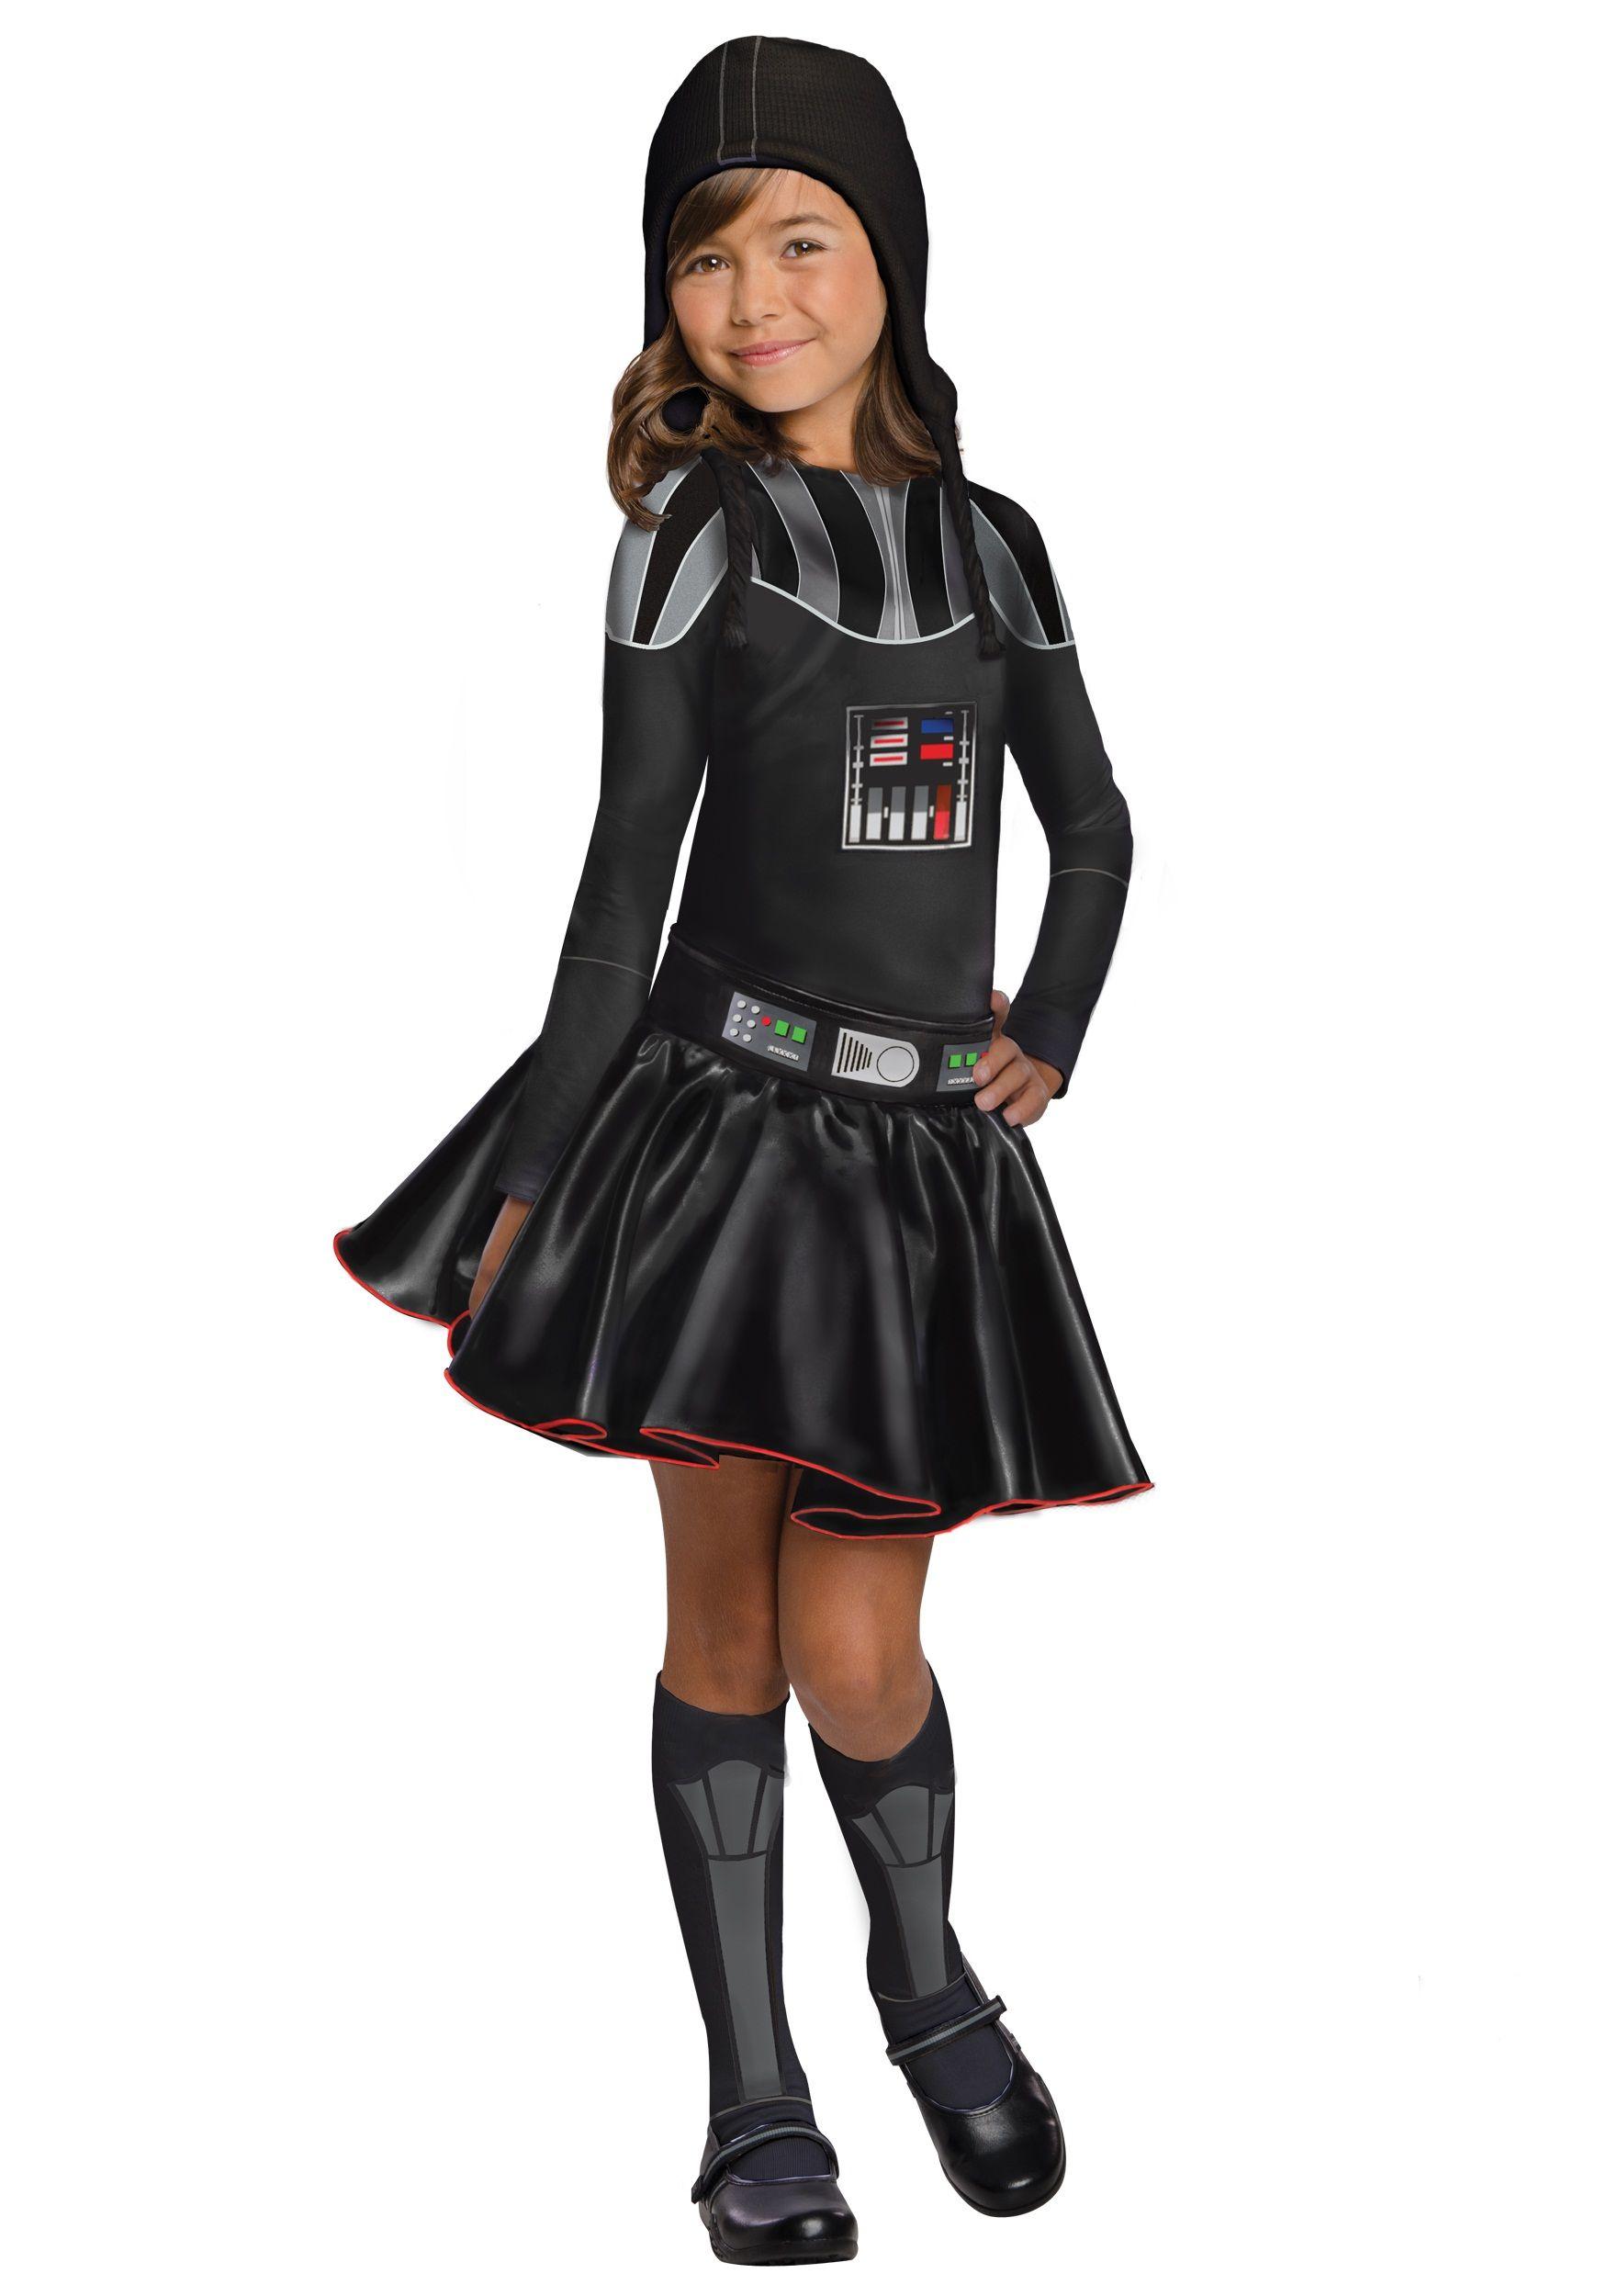 Darth Vader Costumes - Deluxe Adult, Child, Kid Darth Vader ...